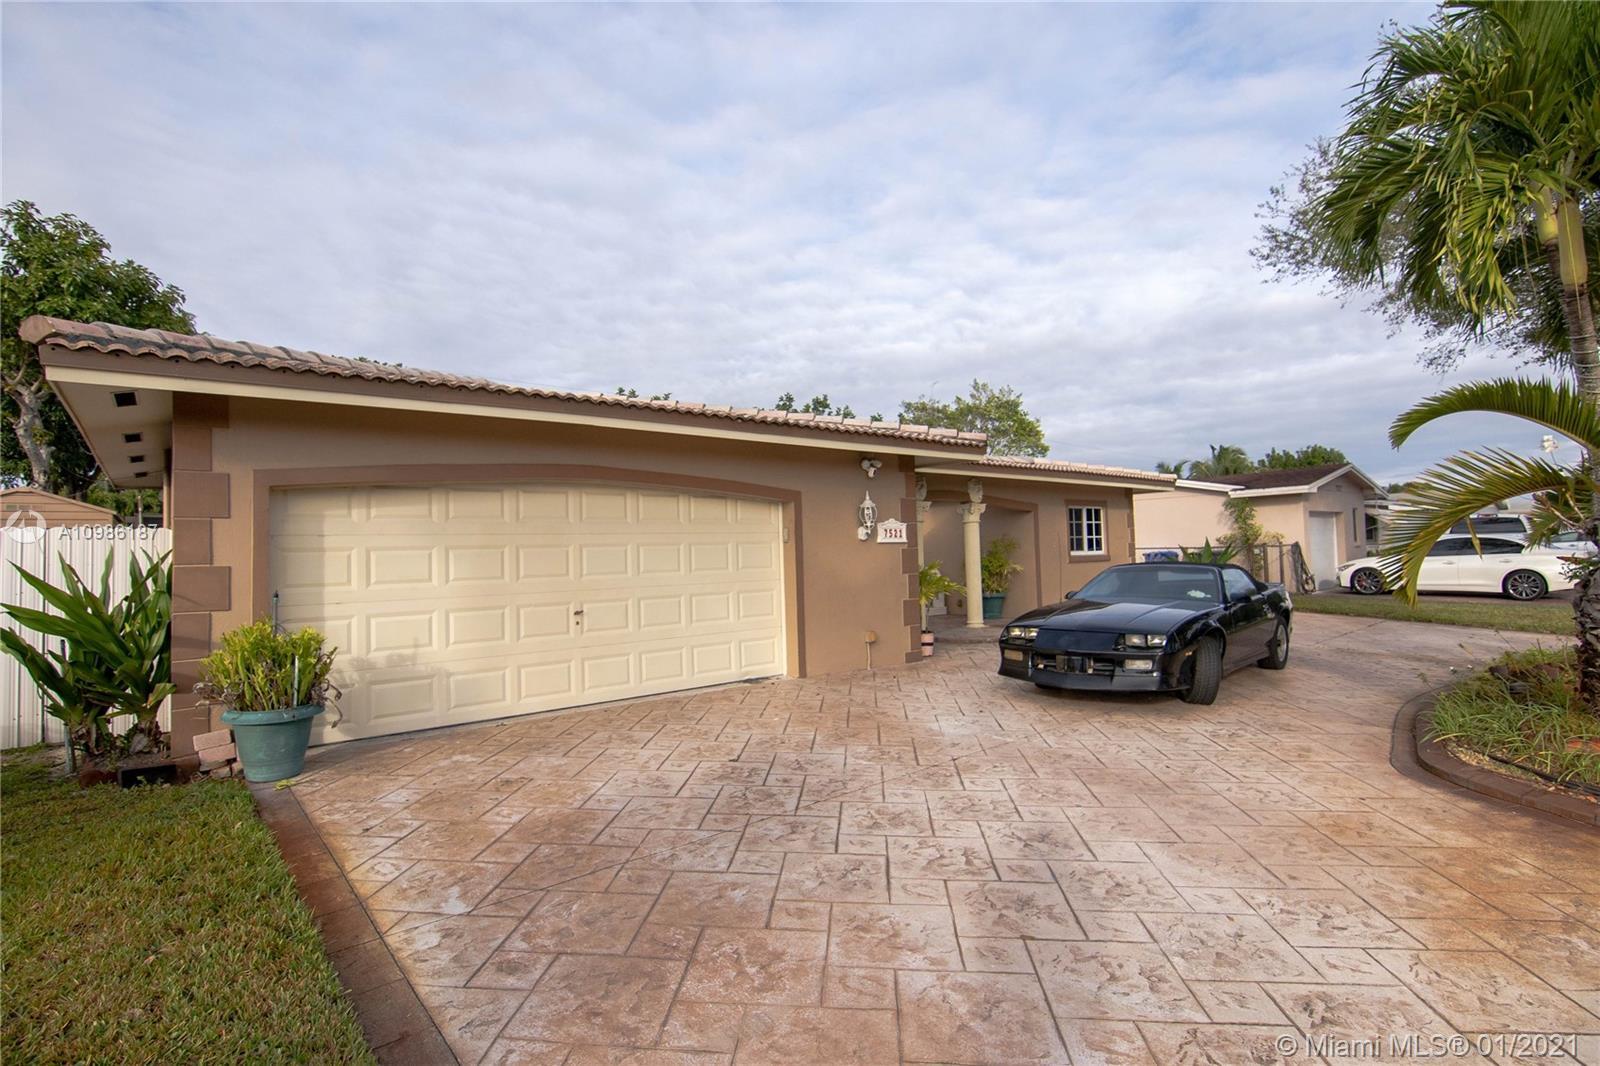 Boulevard Heights - 7521 Johnson St, Hollywood, FL 33024